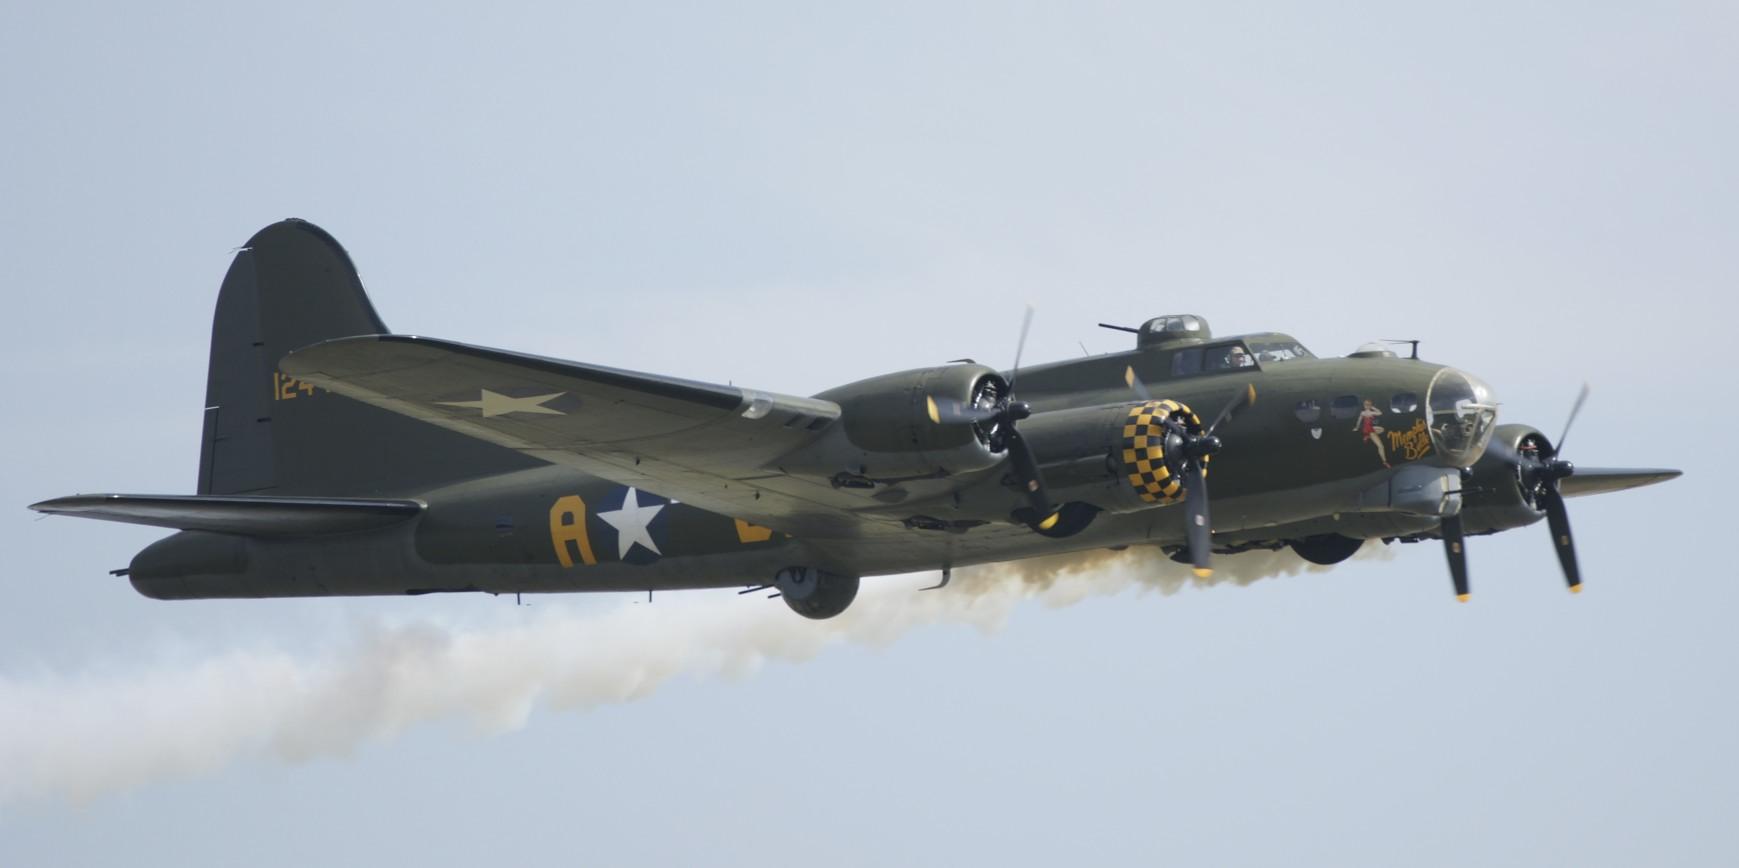 Duxfort 2011 B-17 Flying Fortress Sally B